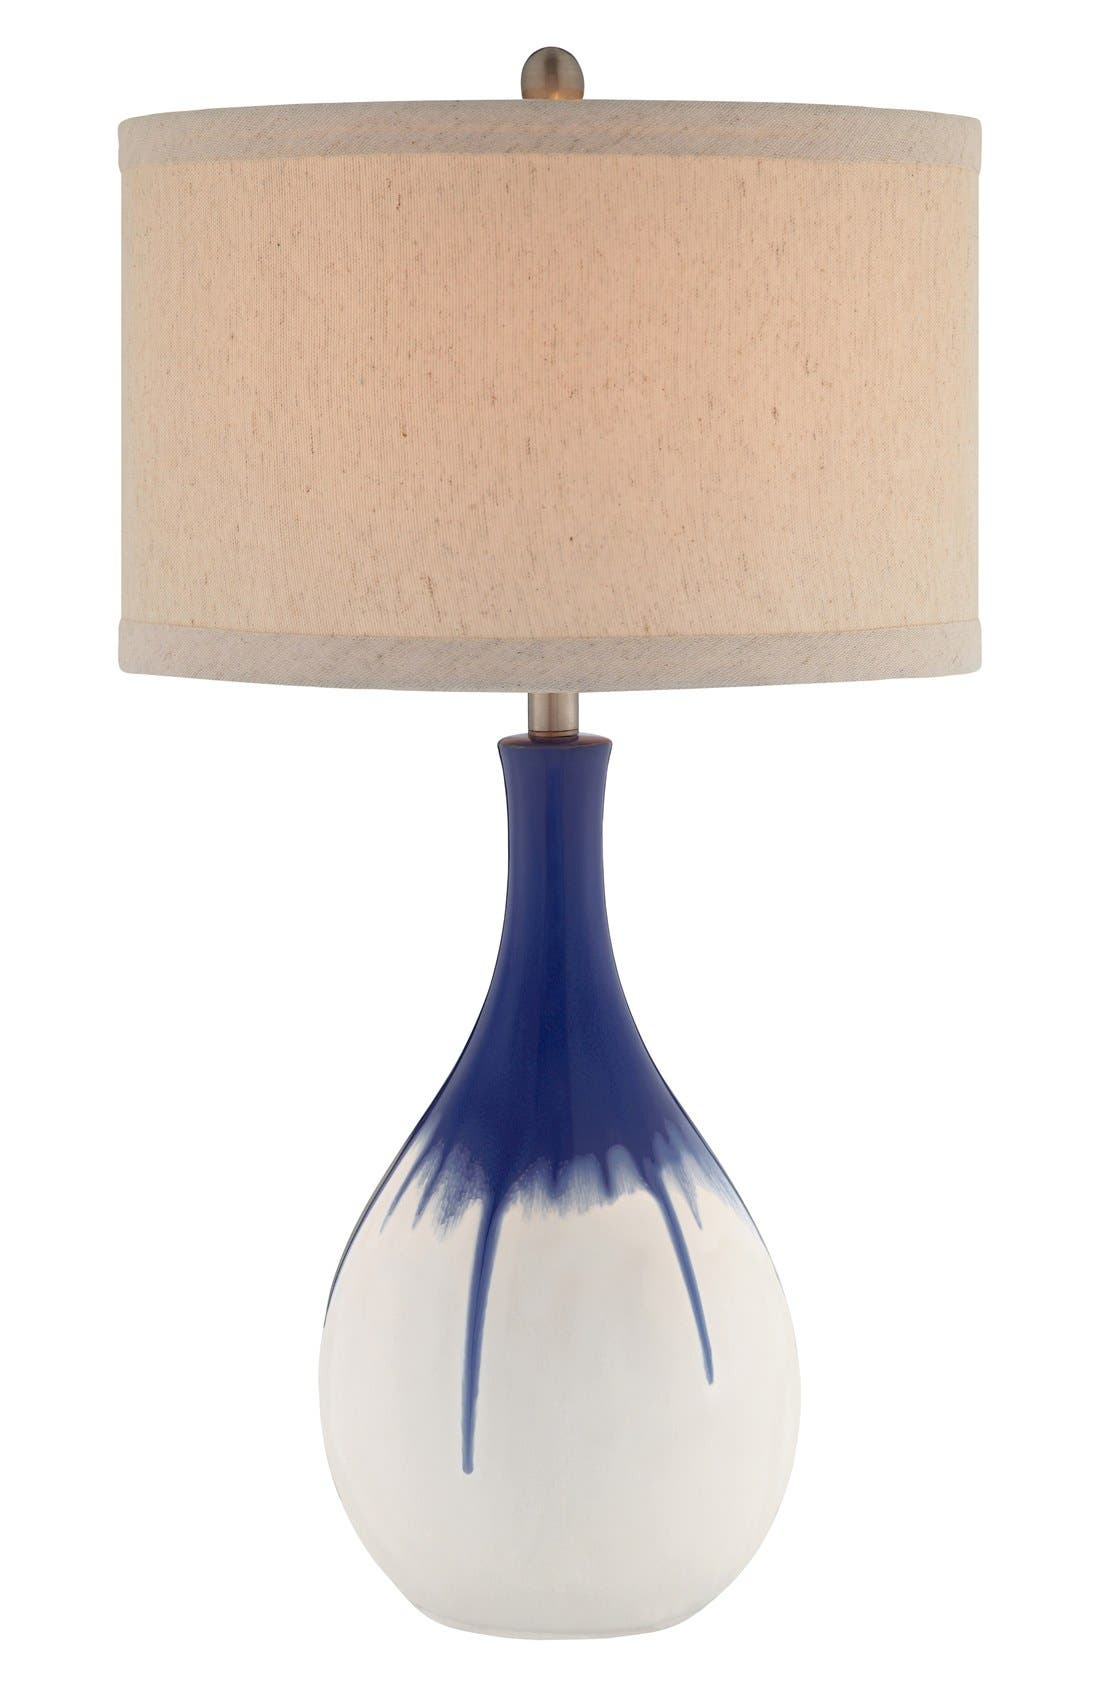 Main Image - JAlexander Lighting Cobalt Ceramic Table Lamp